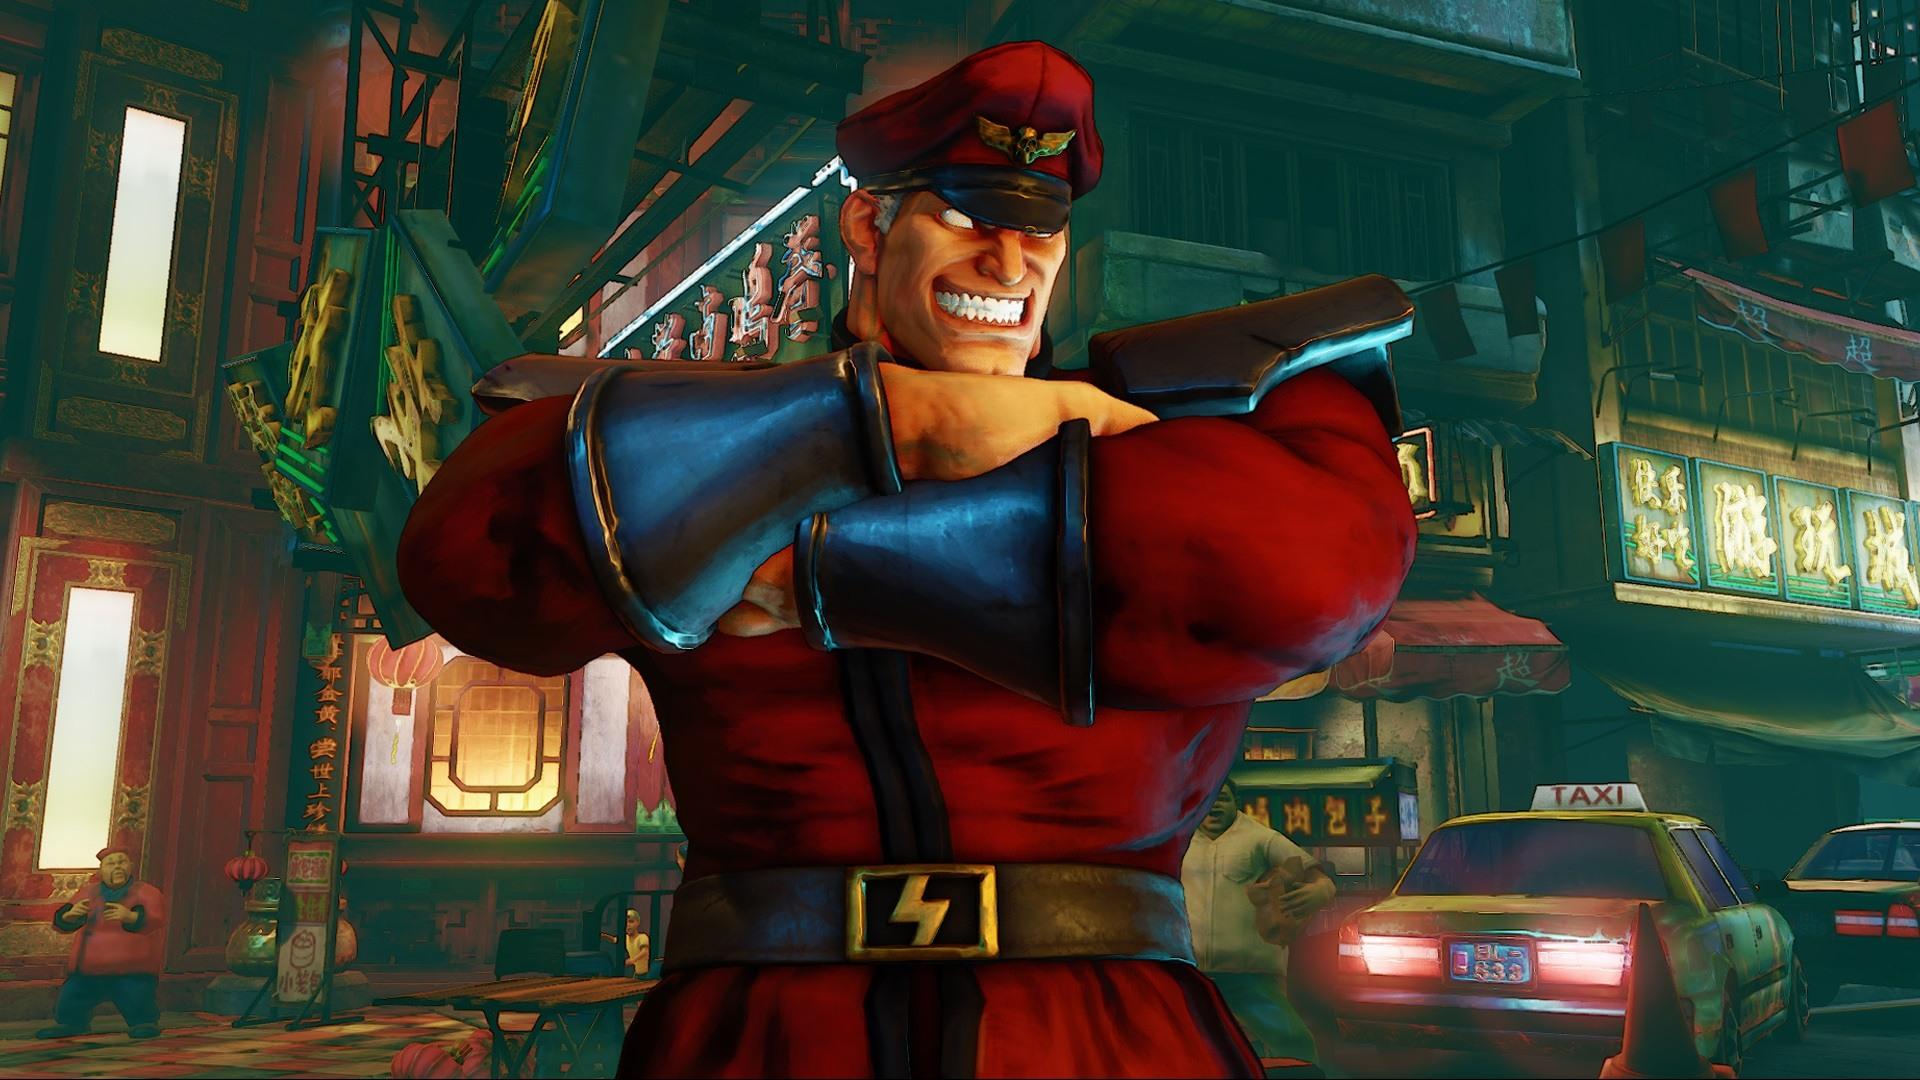 Street Fighter 5 Reveals M. Bison in New Trailer